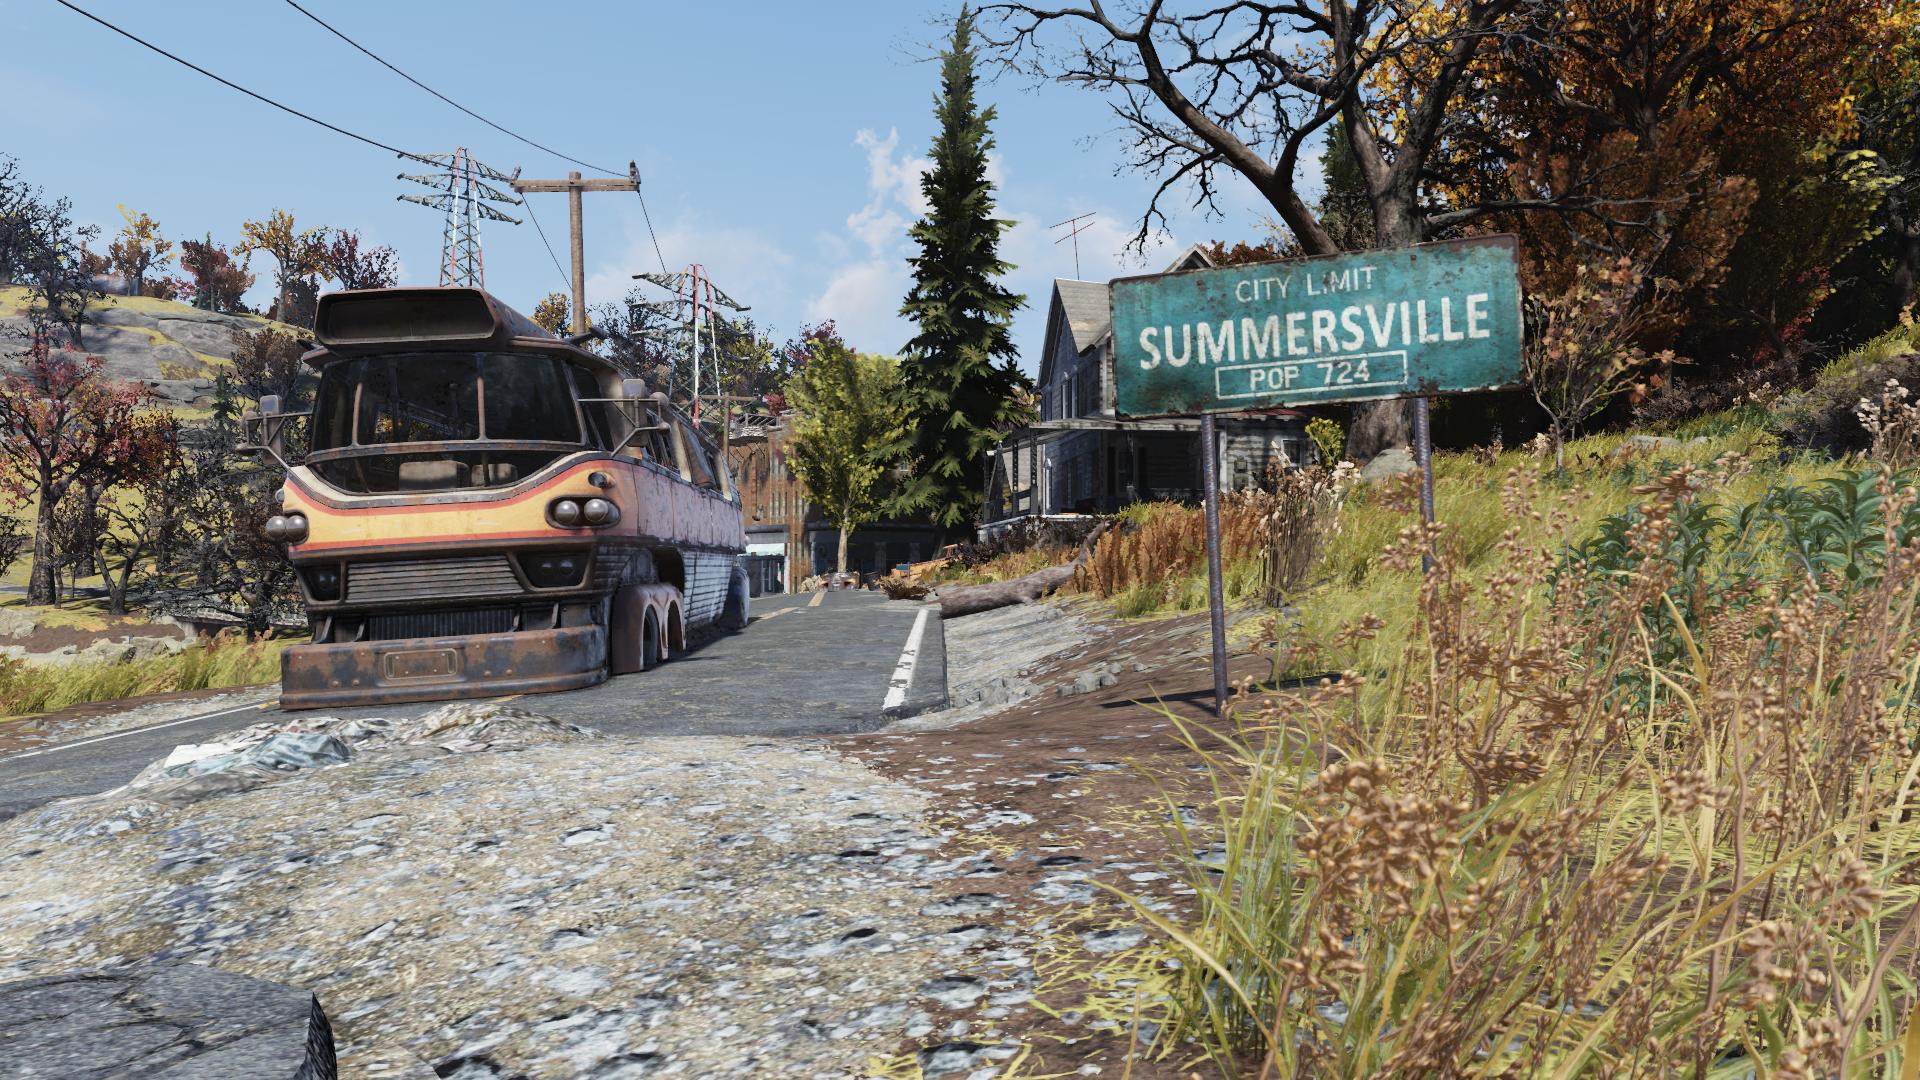 Summersville